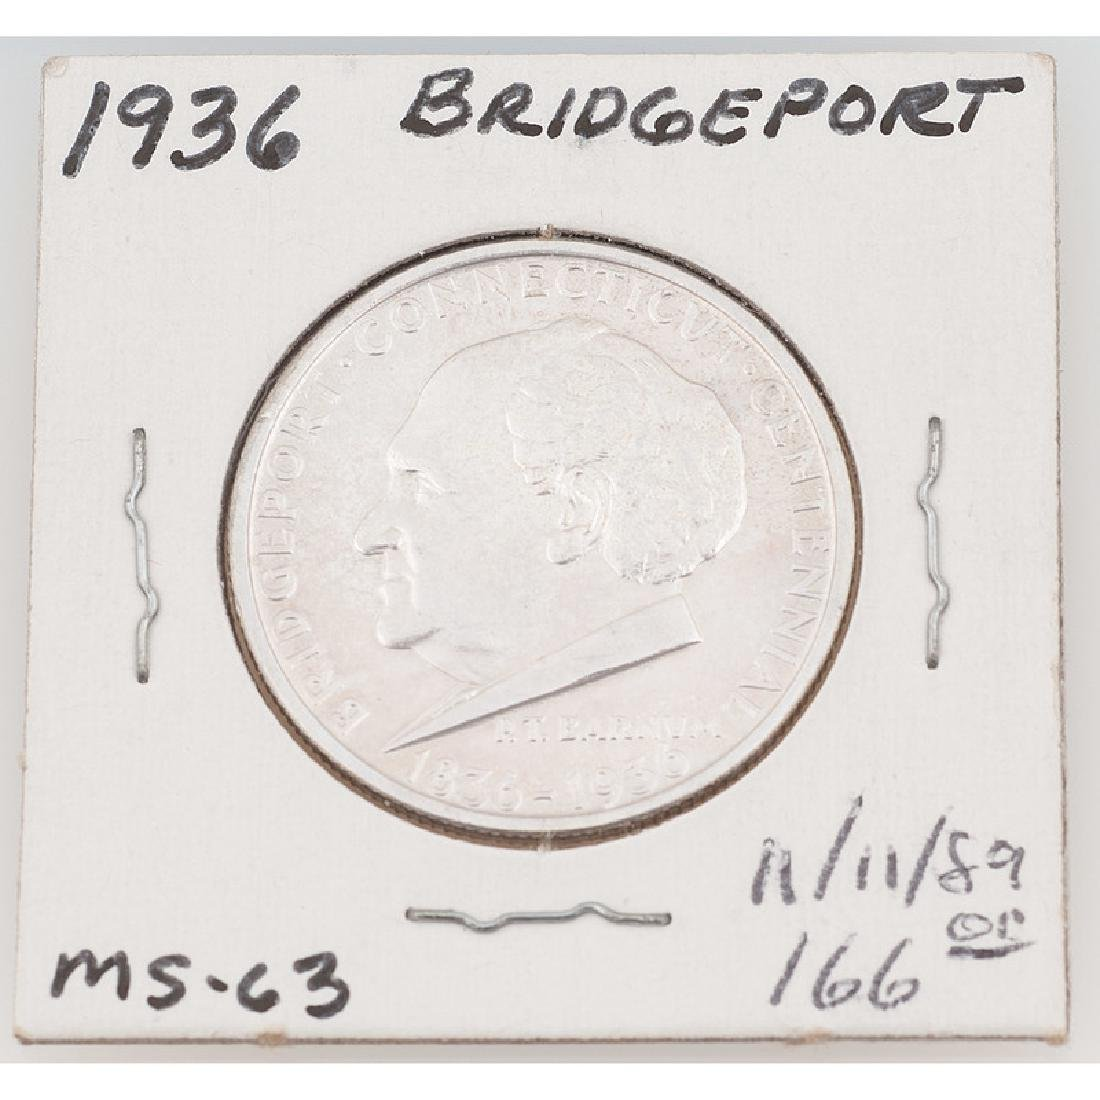 United States Bridgeport, Connecticut Centennial